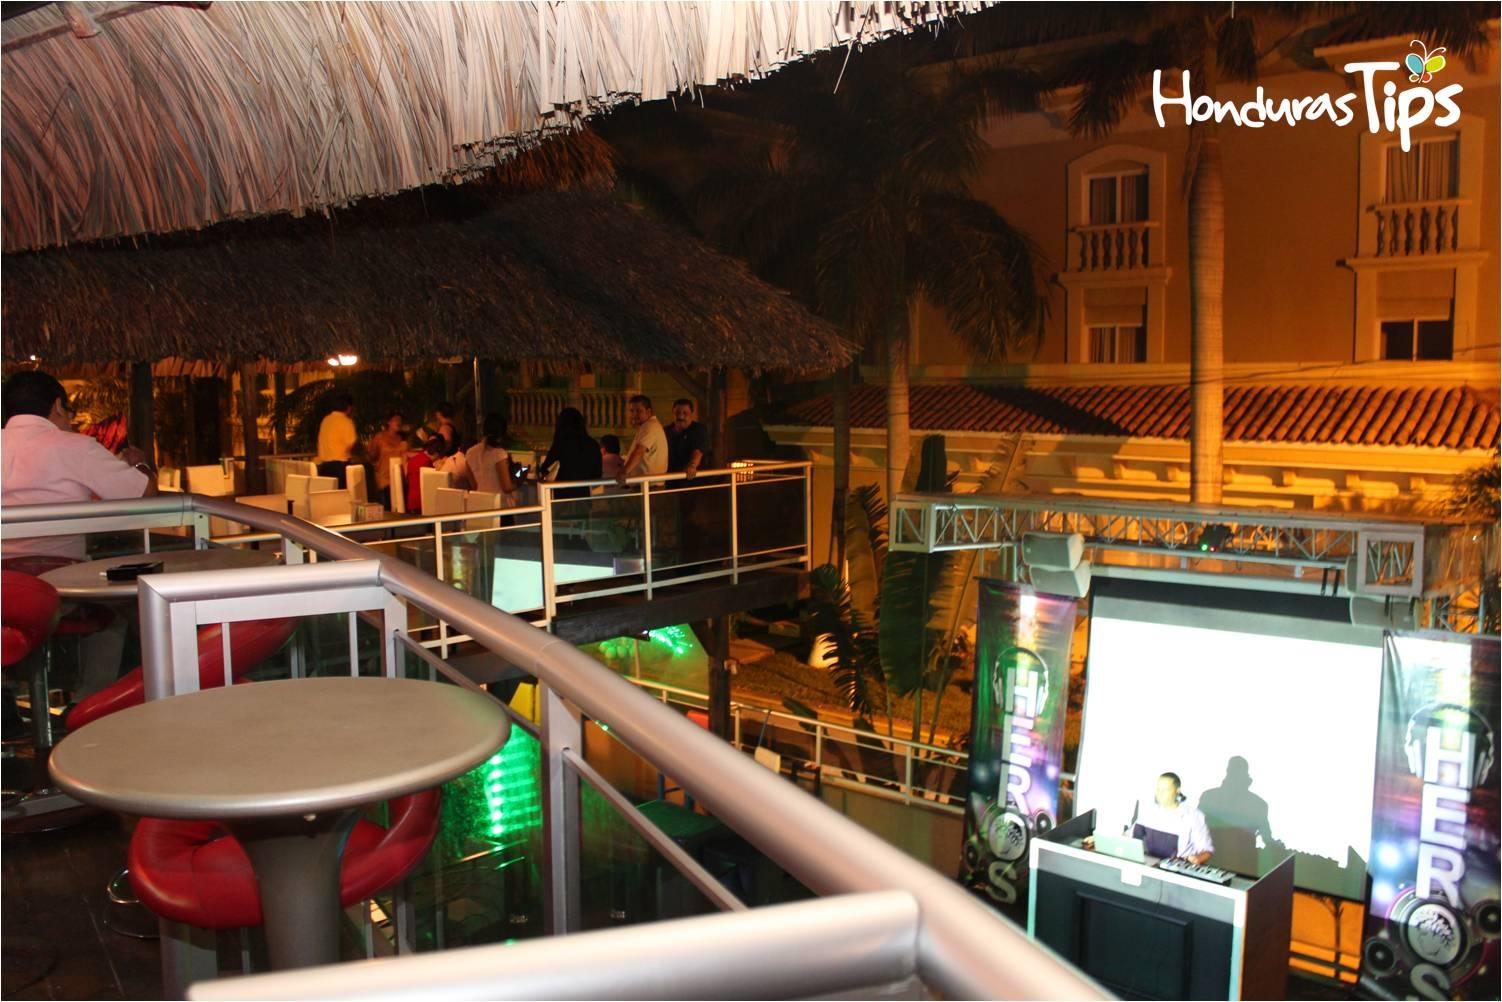 Restaurante La Palapa Bar Amp Grill Honduras Tips